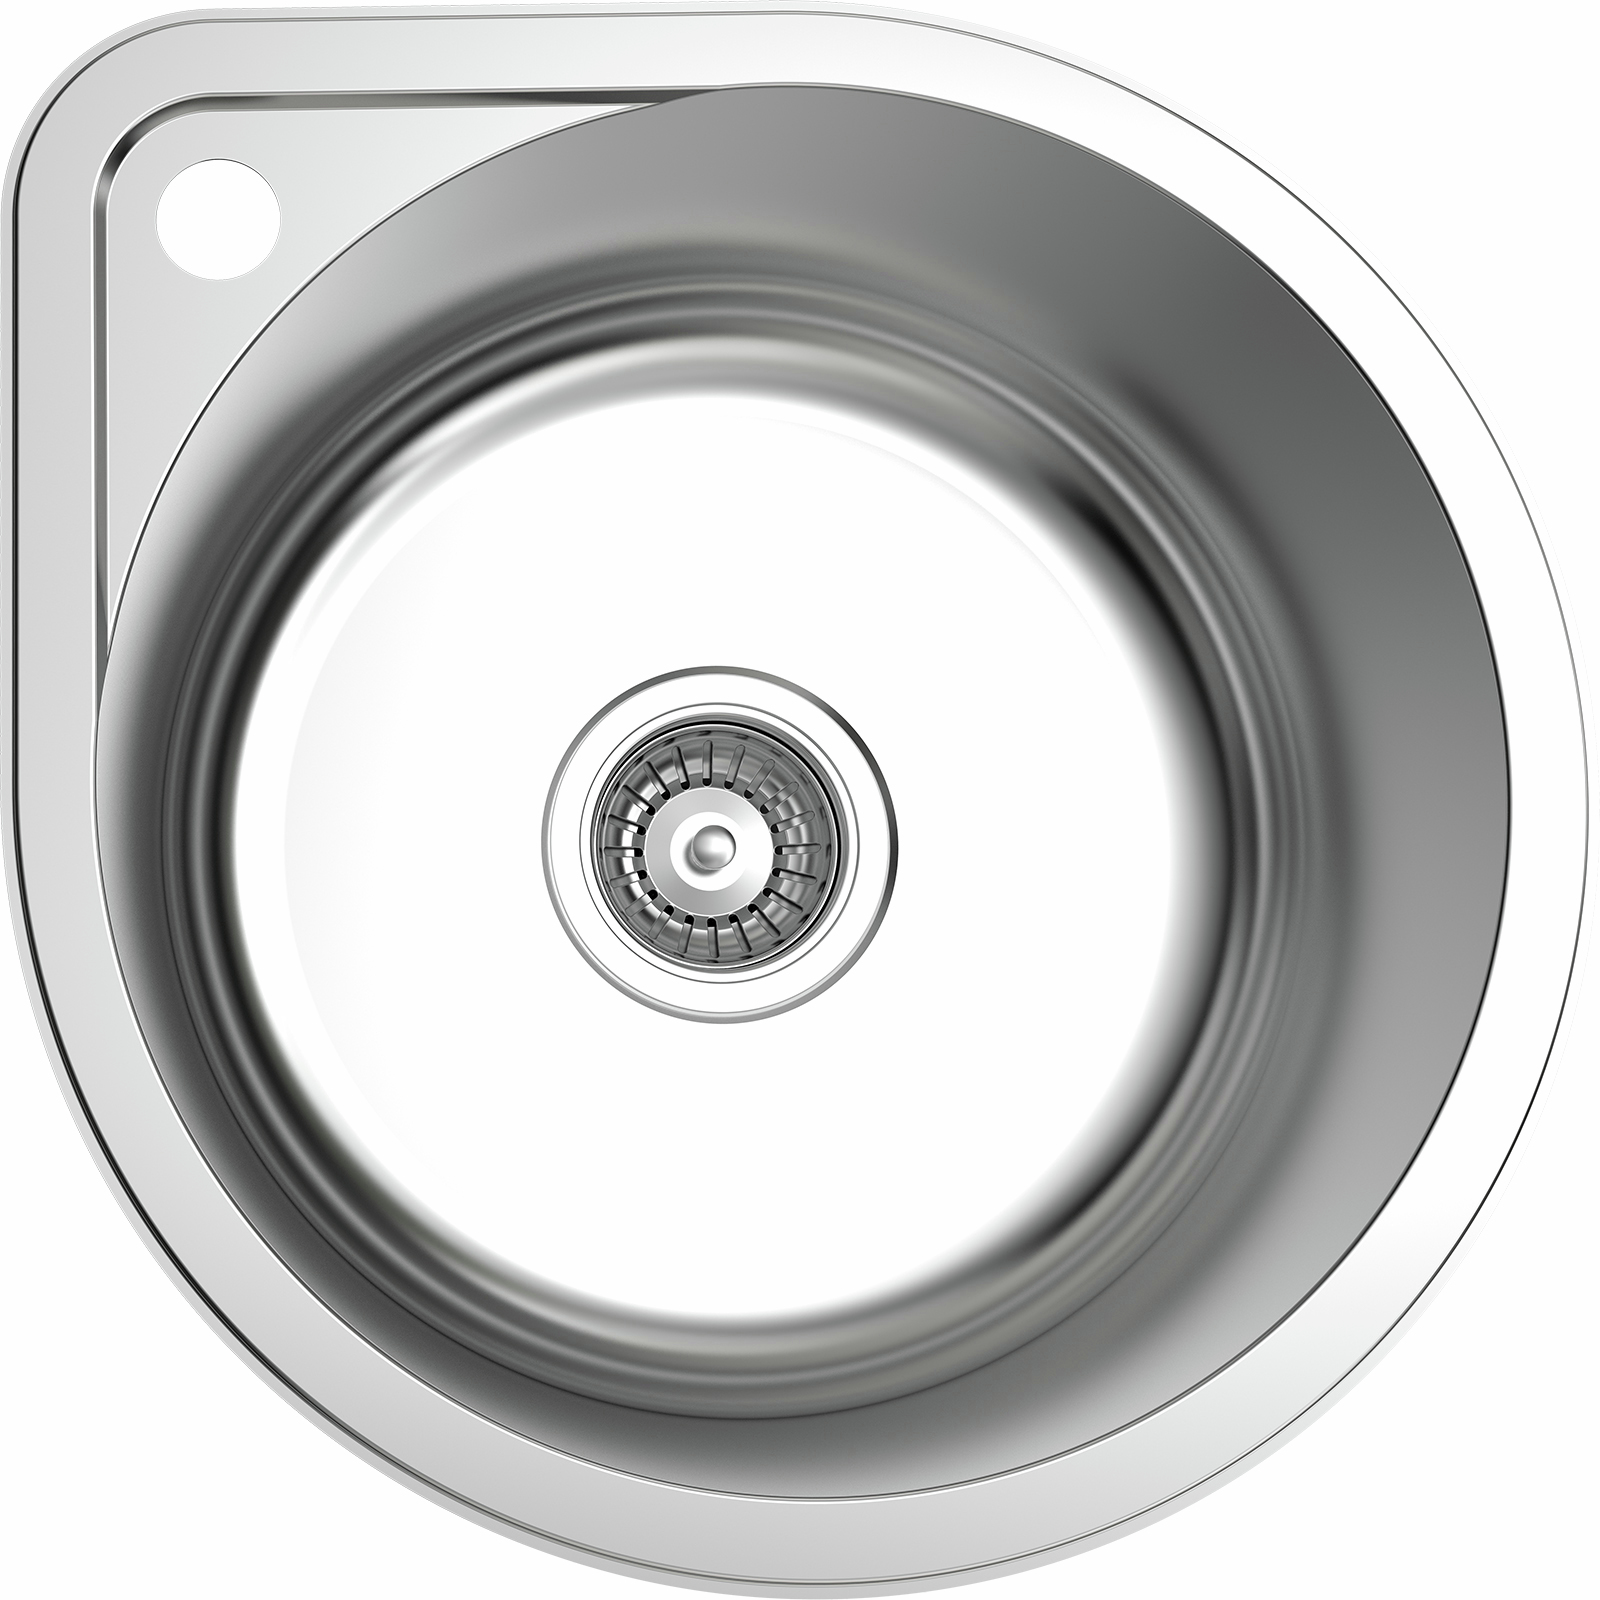 Mondella Resonance Single Bowl Round Sink With Tap Landing